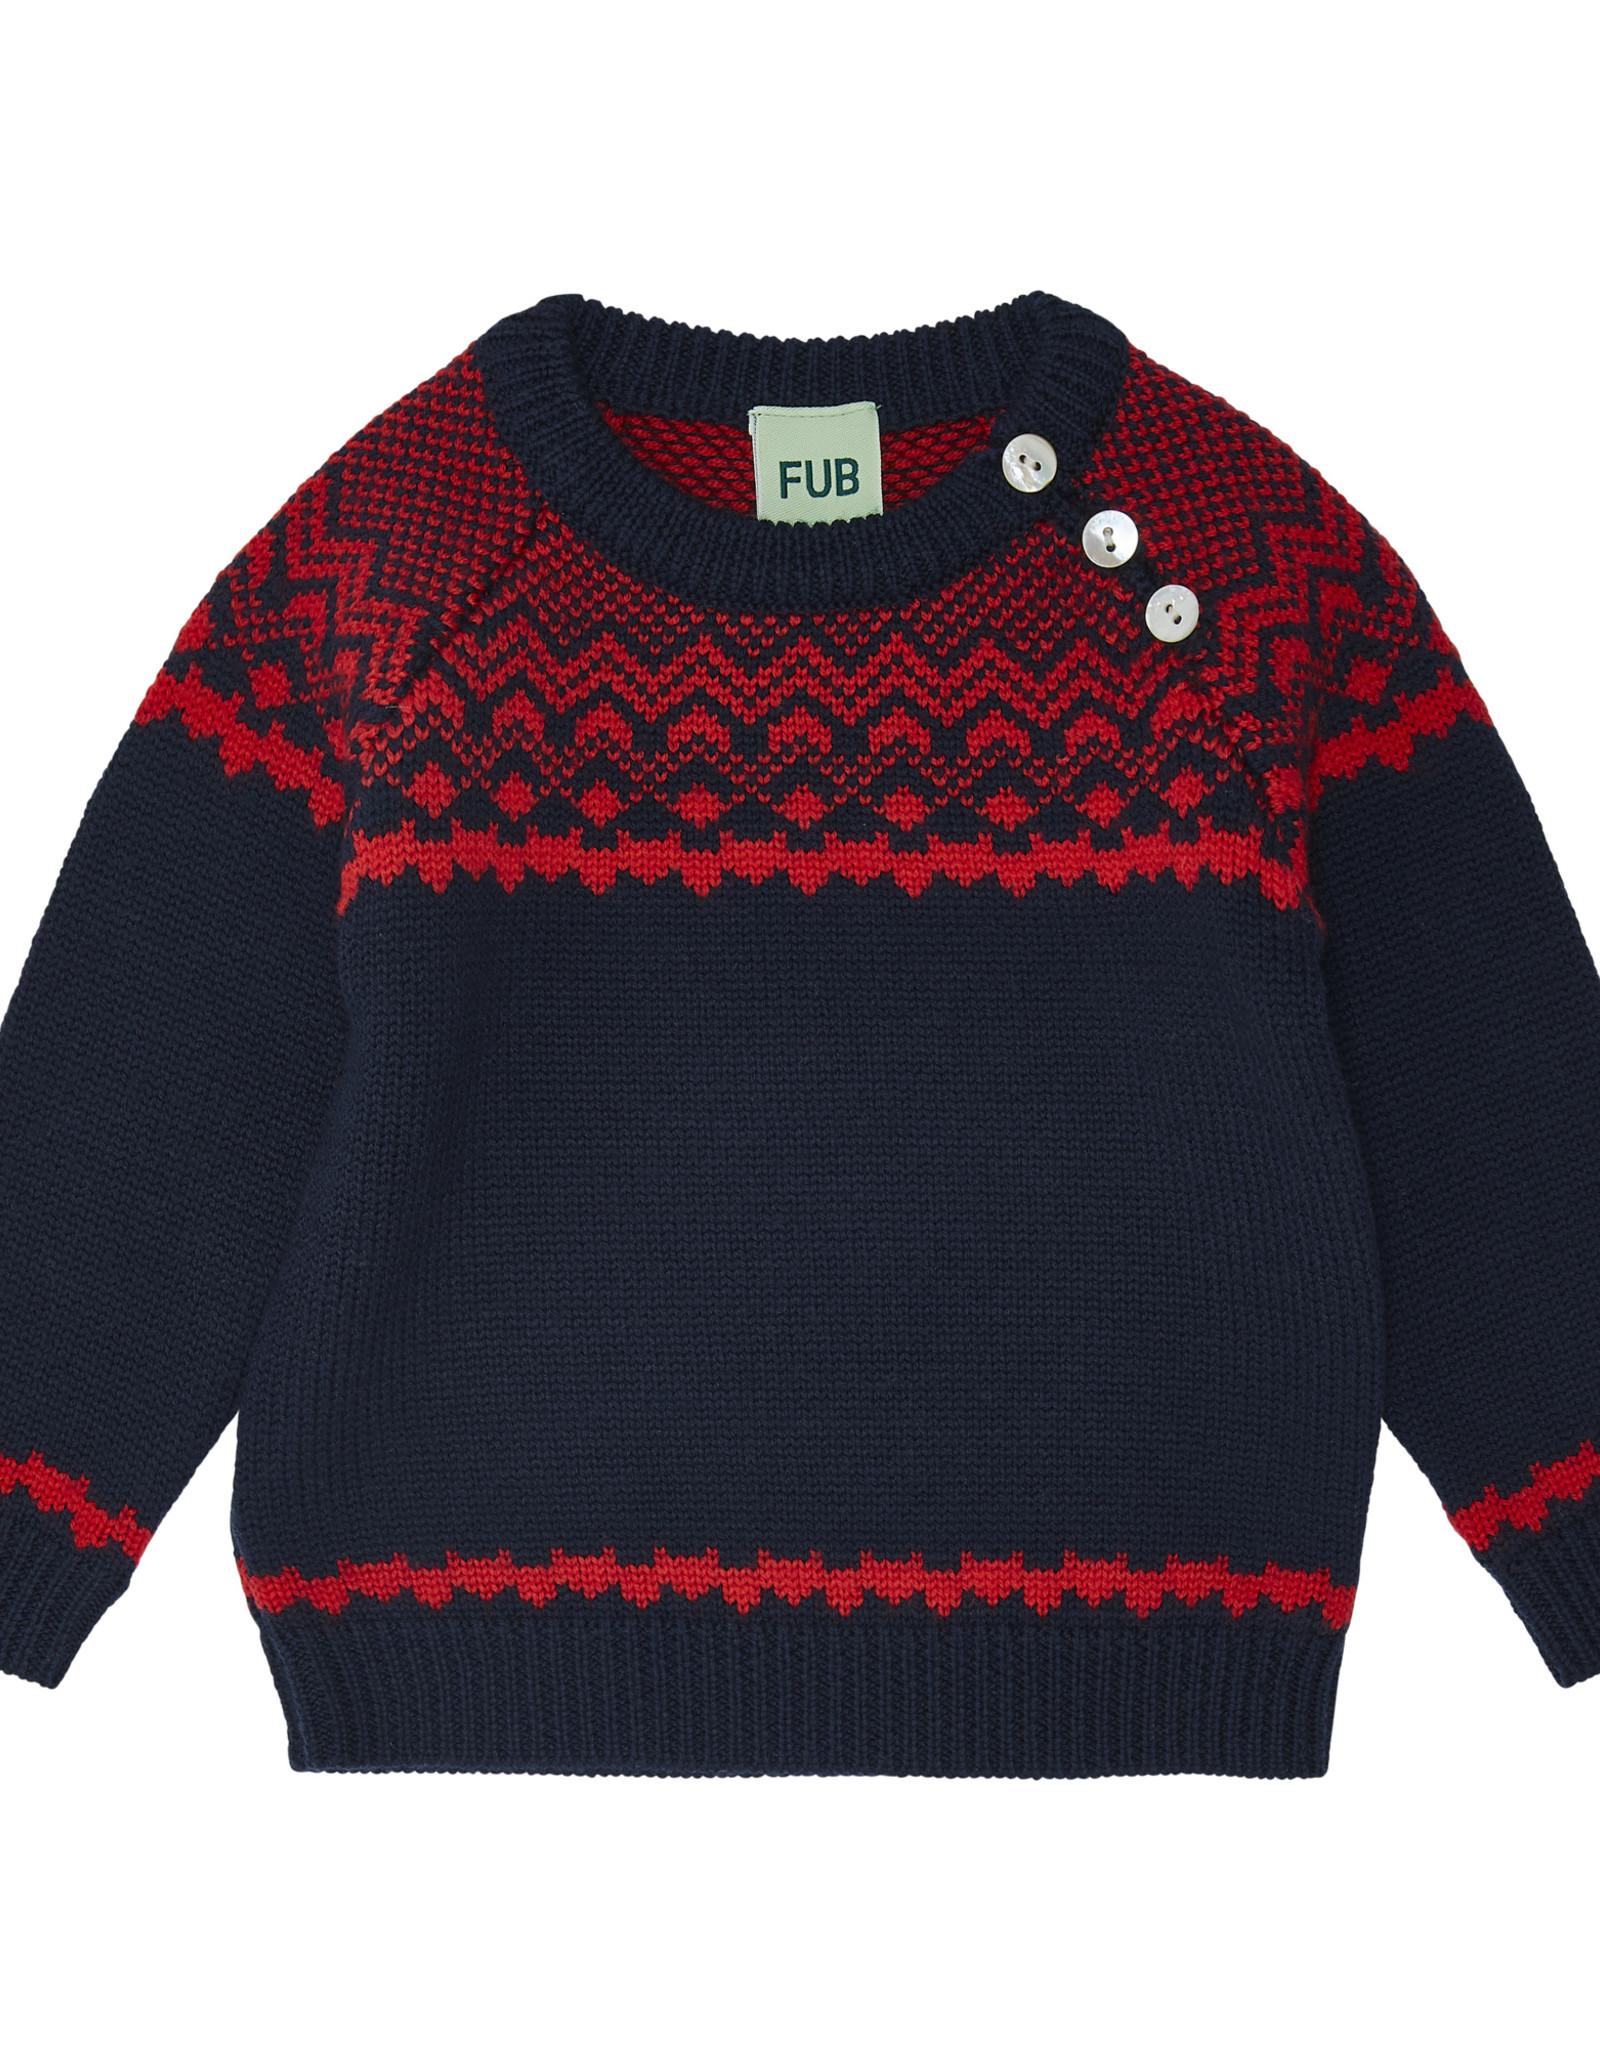 Fub Baby Nordic Sweater